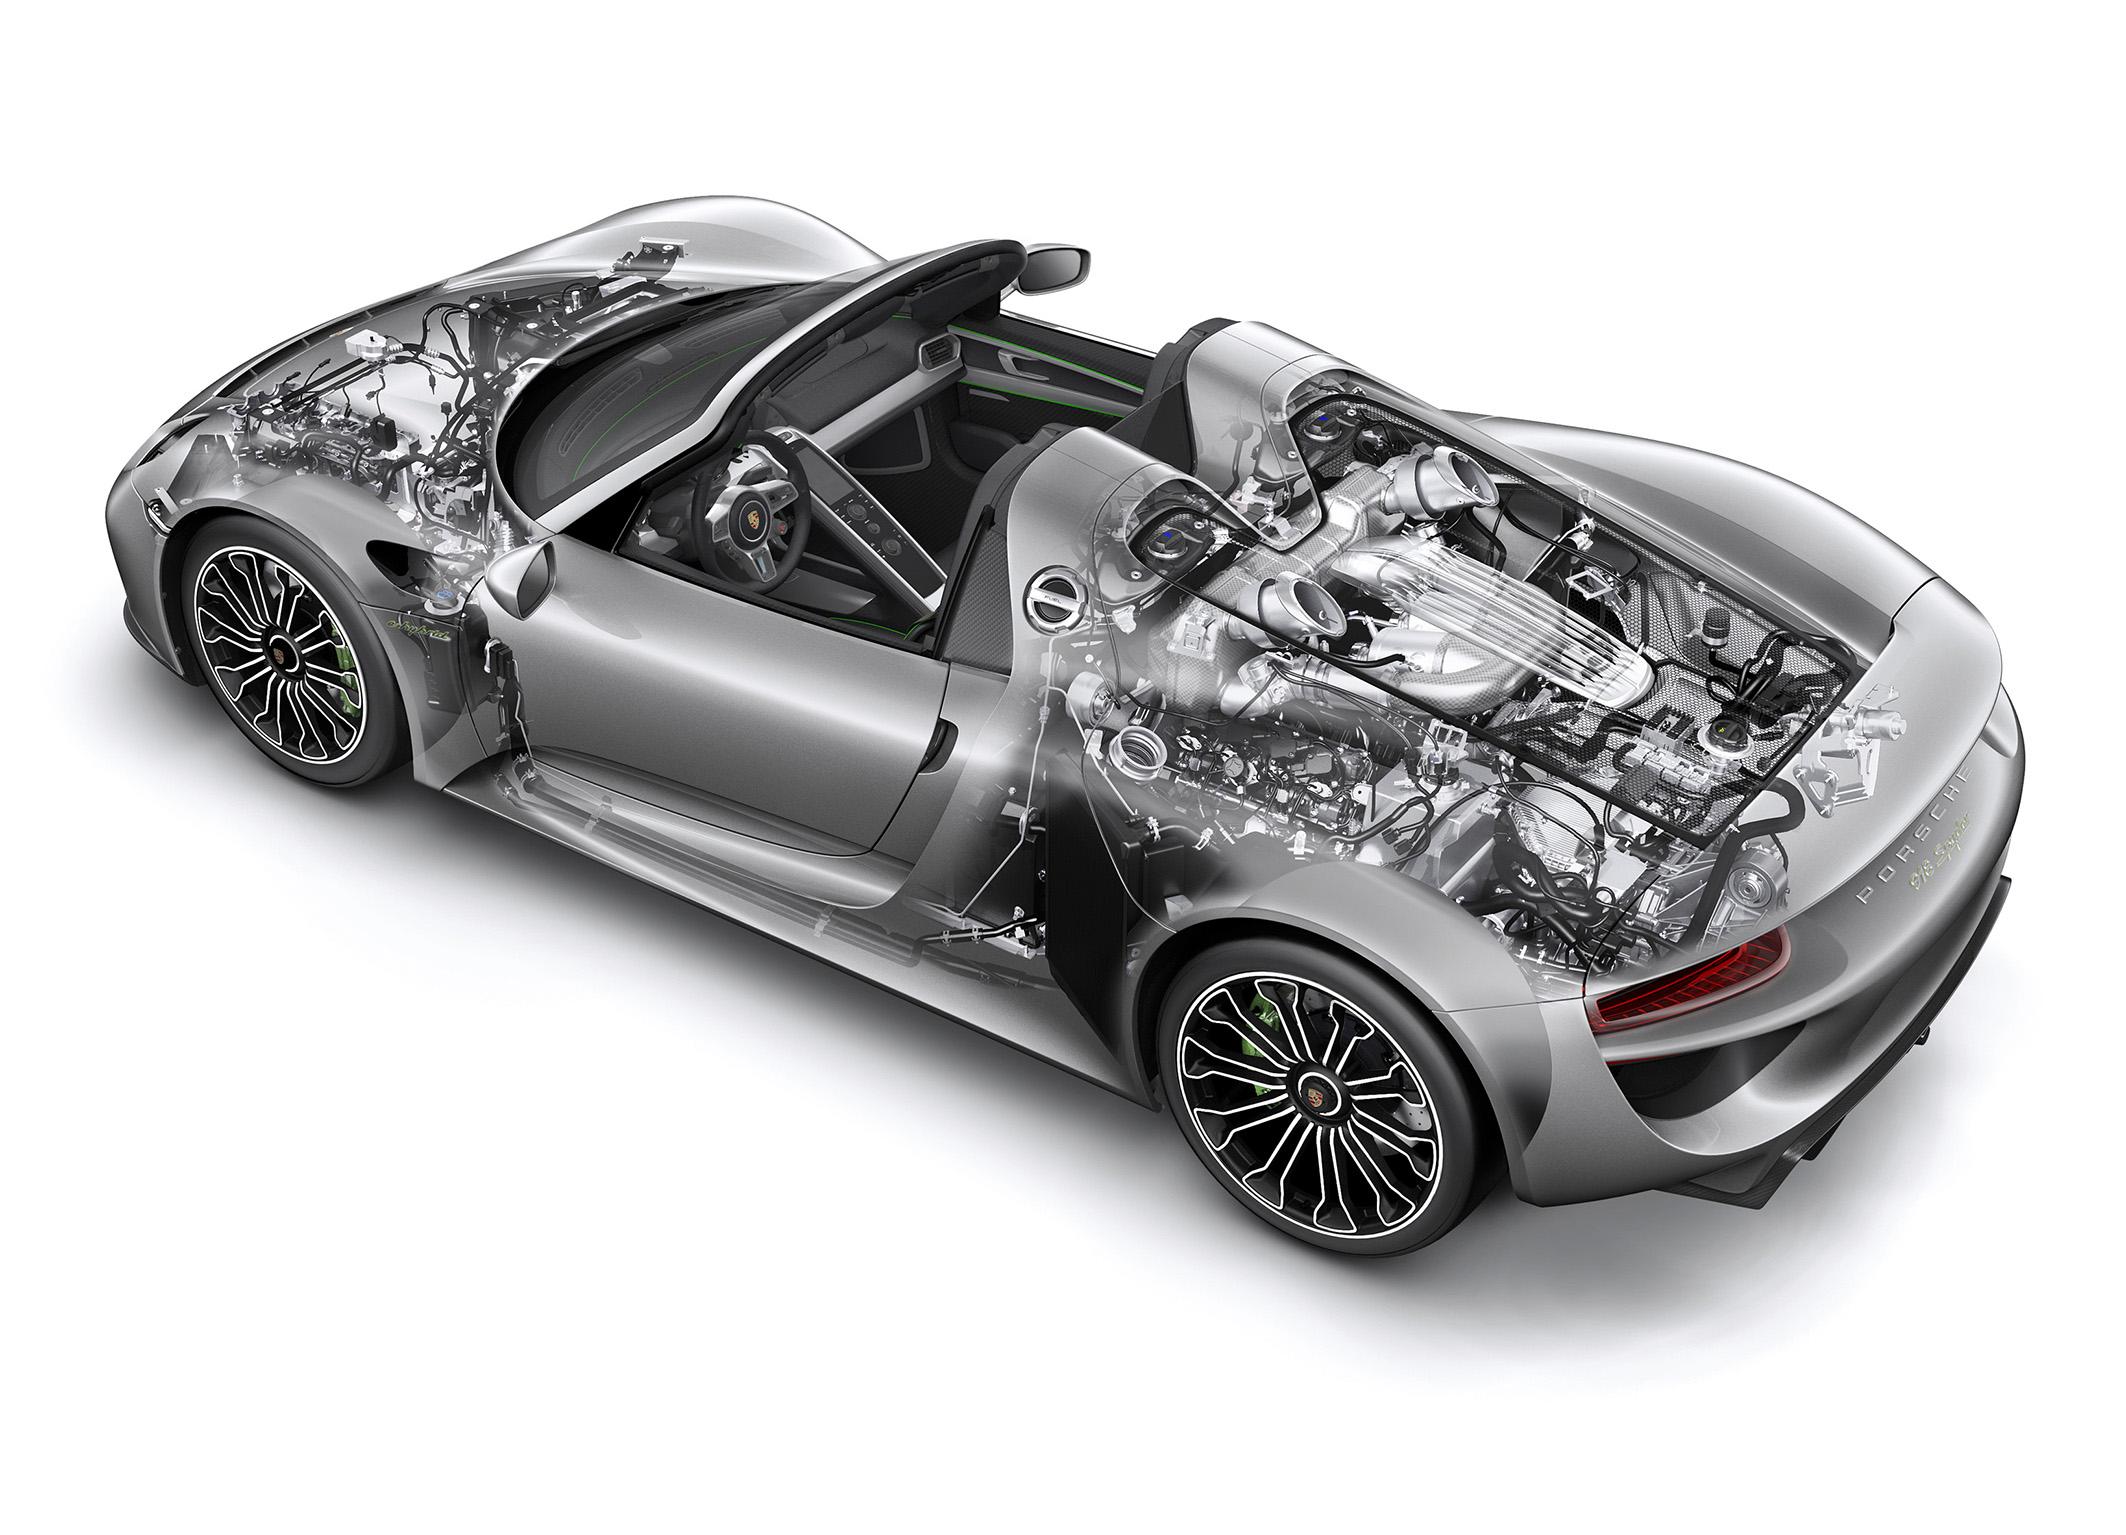 Porsche 918 Spyder Phantom graphic